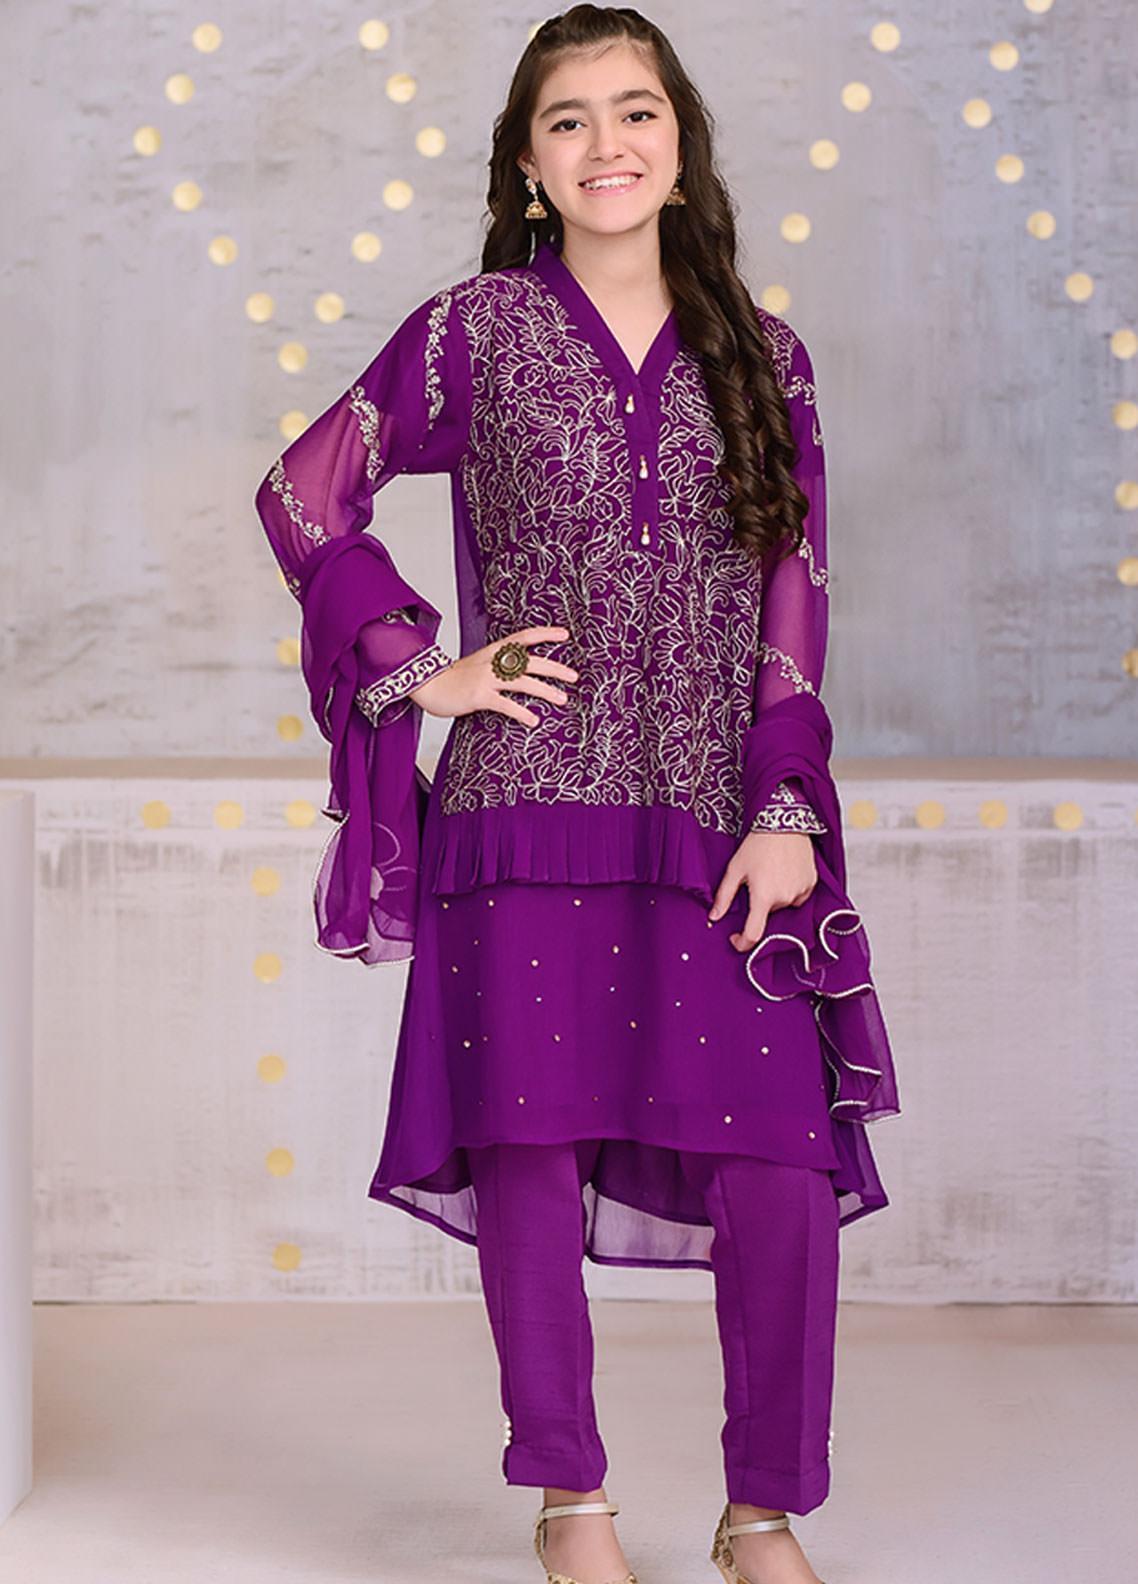 Ochre Chiffon Formal 3 Piece Suit for Girls -  OFW 263 Purple